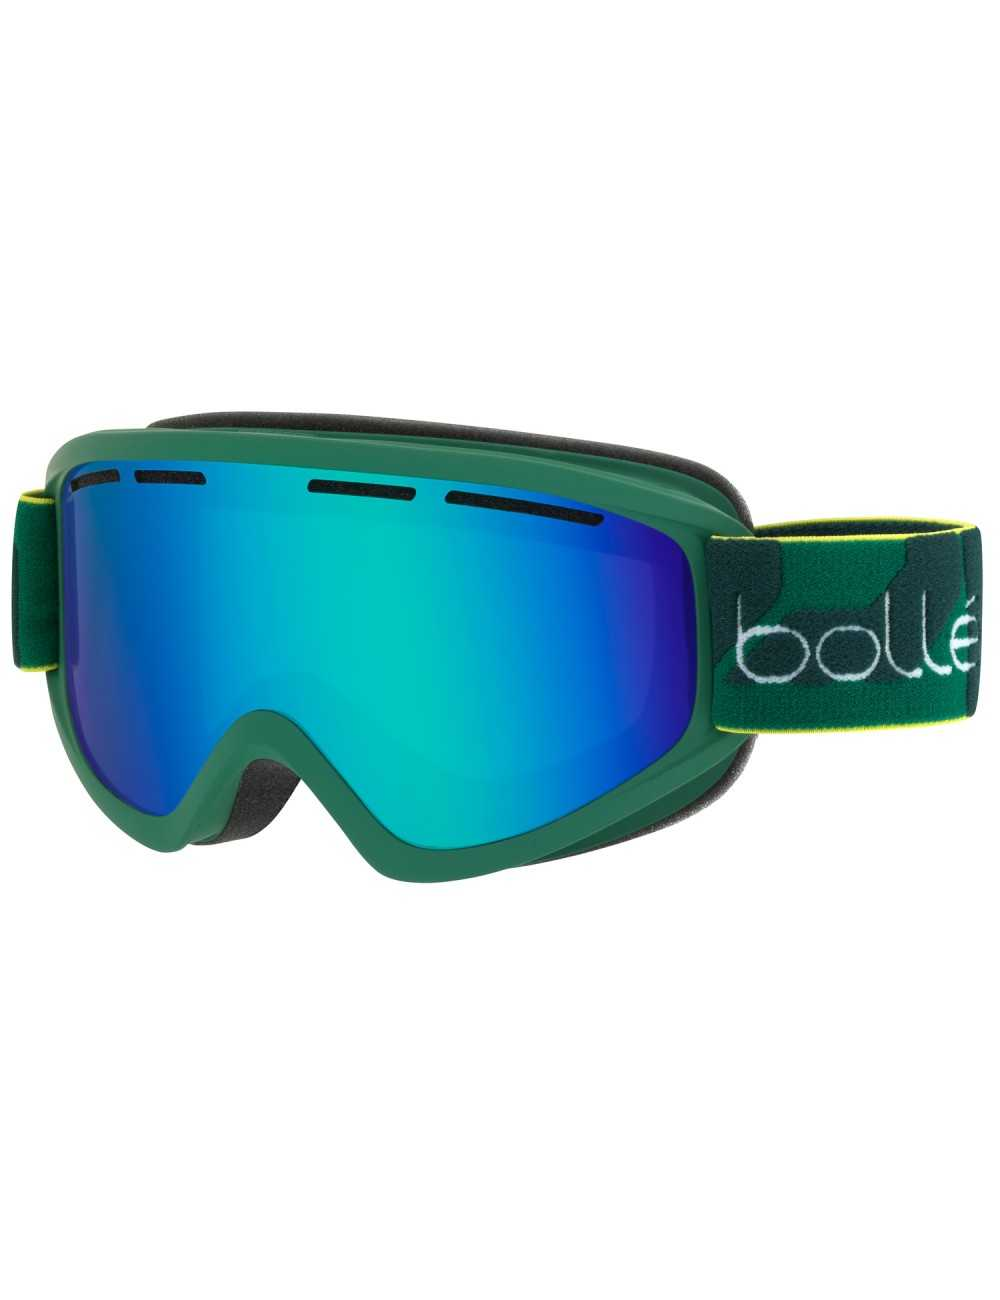 Bolle Goggle 21805 Schuss